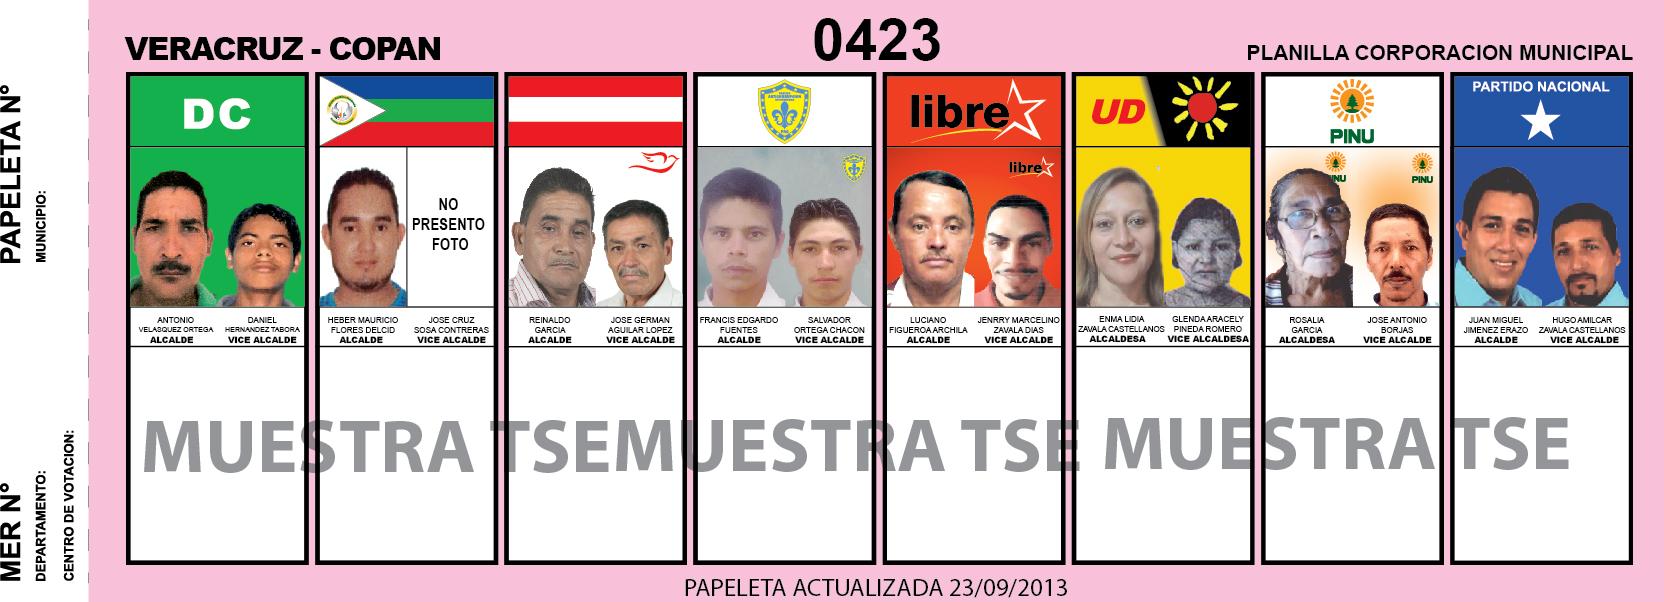 CANDIDATOS 2013 MUNICIPIO VERACRUZ - COPAN - HONDURAS